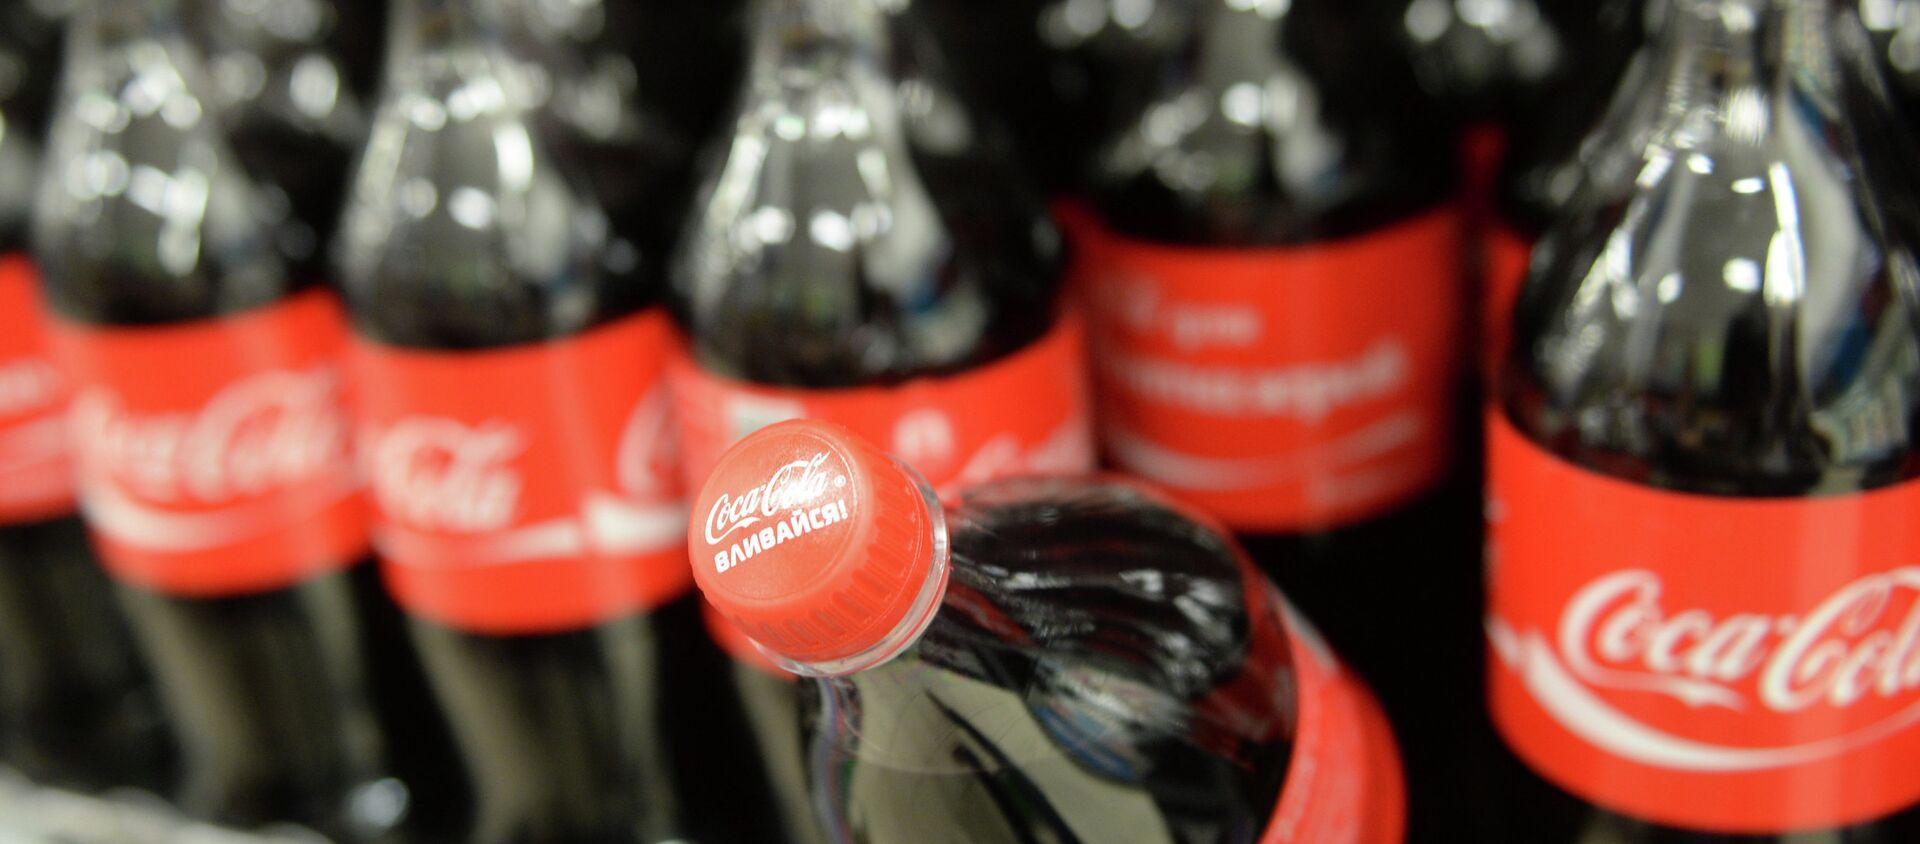 Coca-Cola  - Sputnik Việt Nam, 1920, 09.12.2020